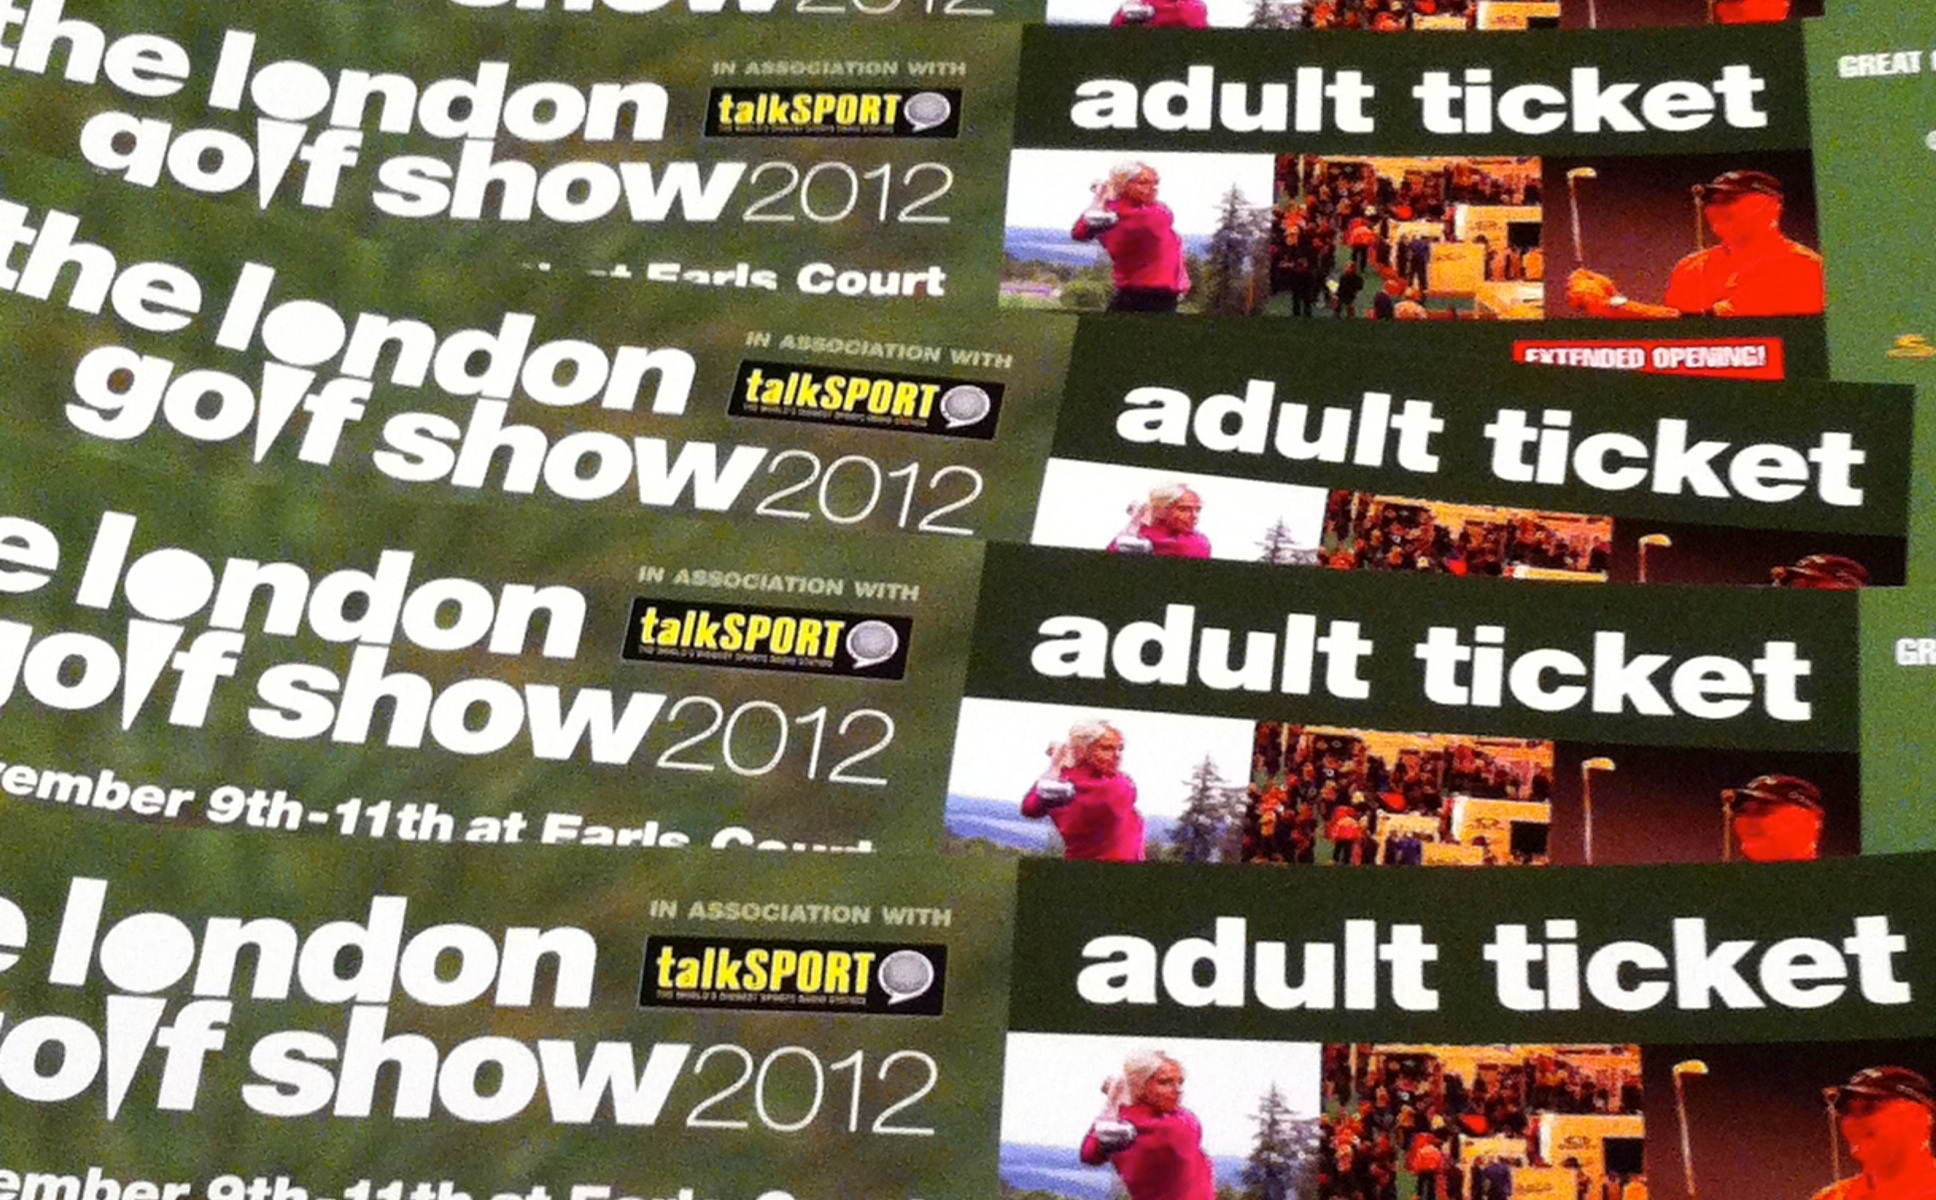 The London Golf Show